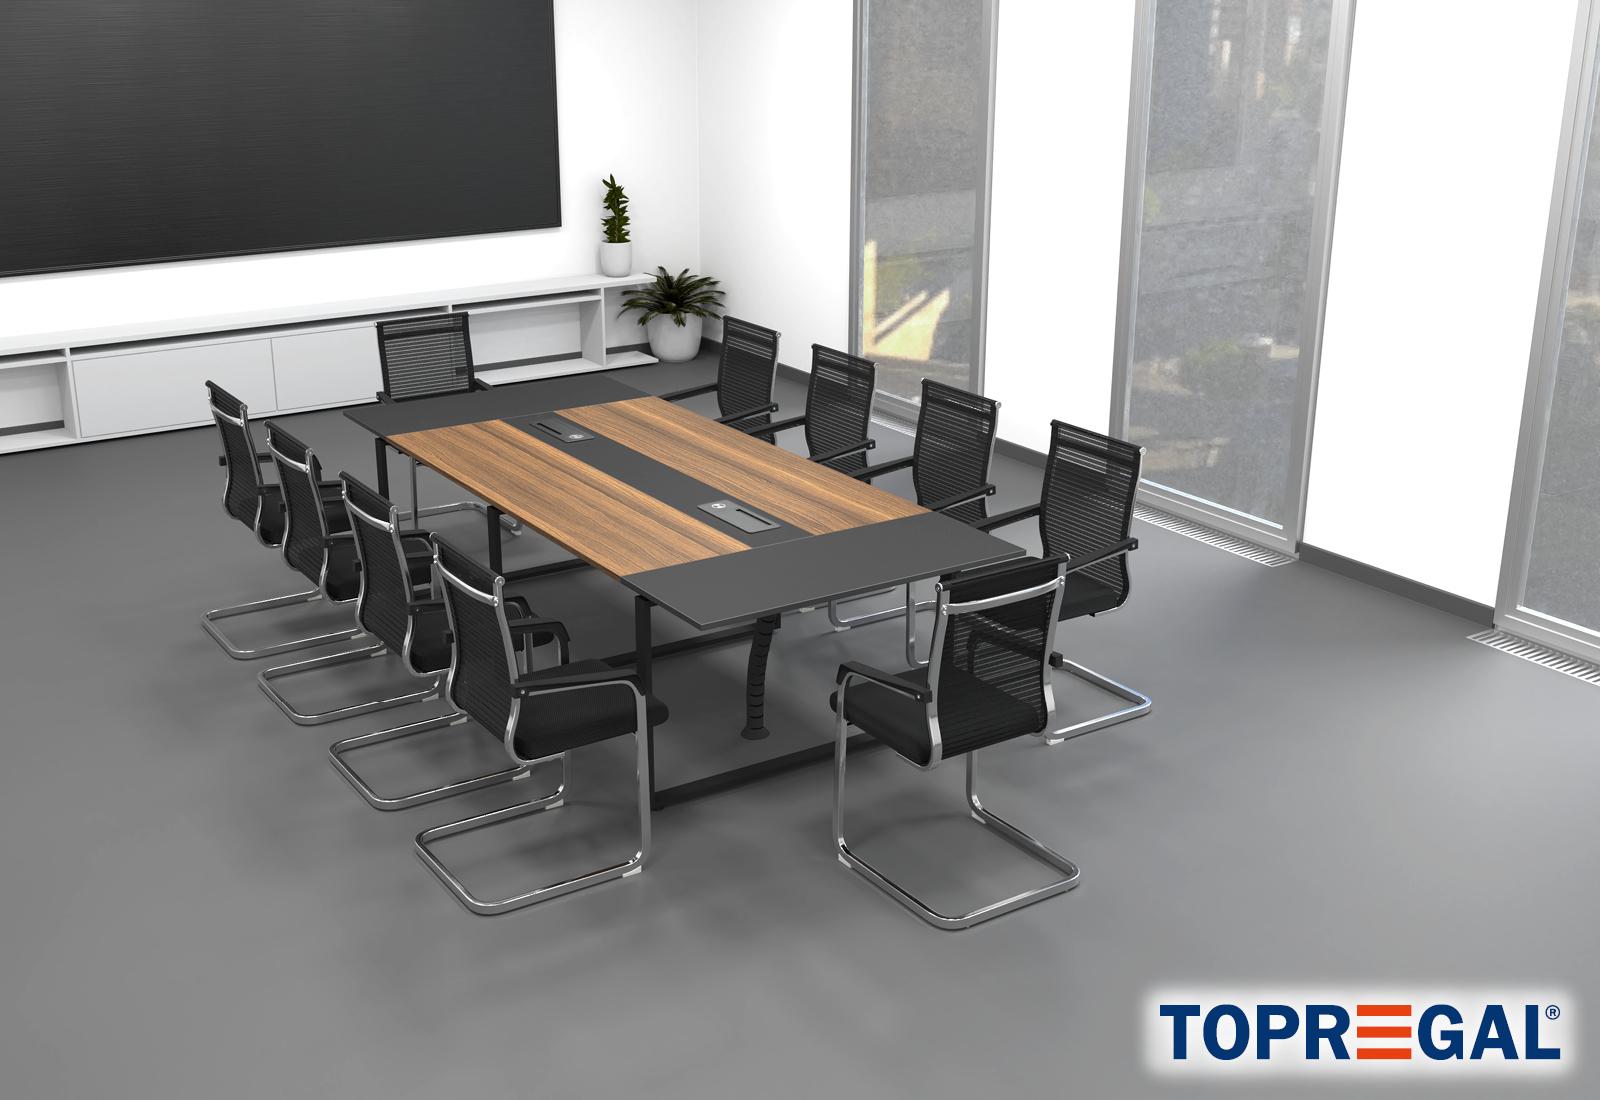 10 Sedie Da Conferenza Sedie Per Visitatori Marina Impilabili Topregal